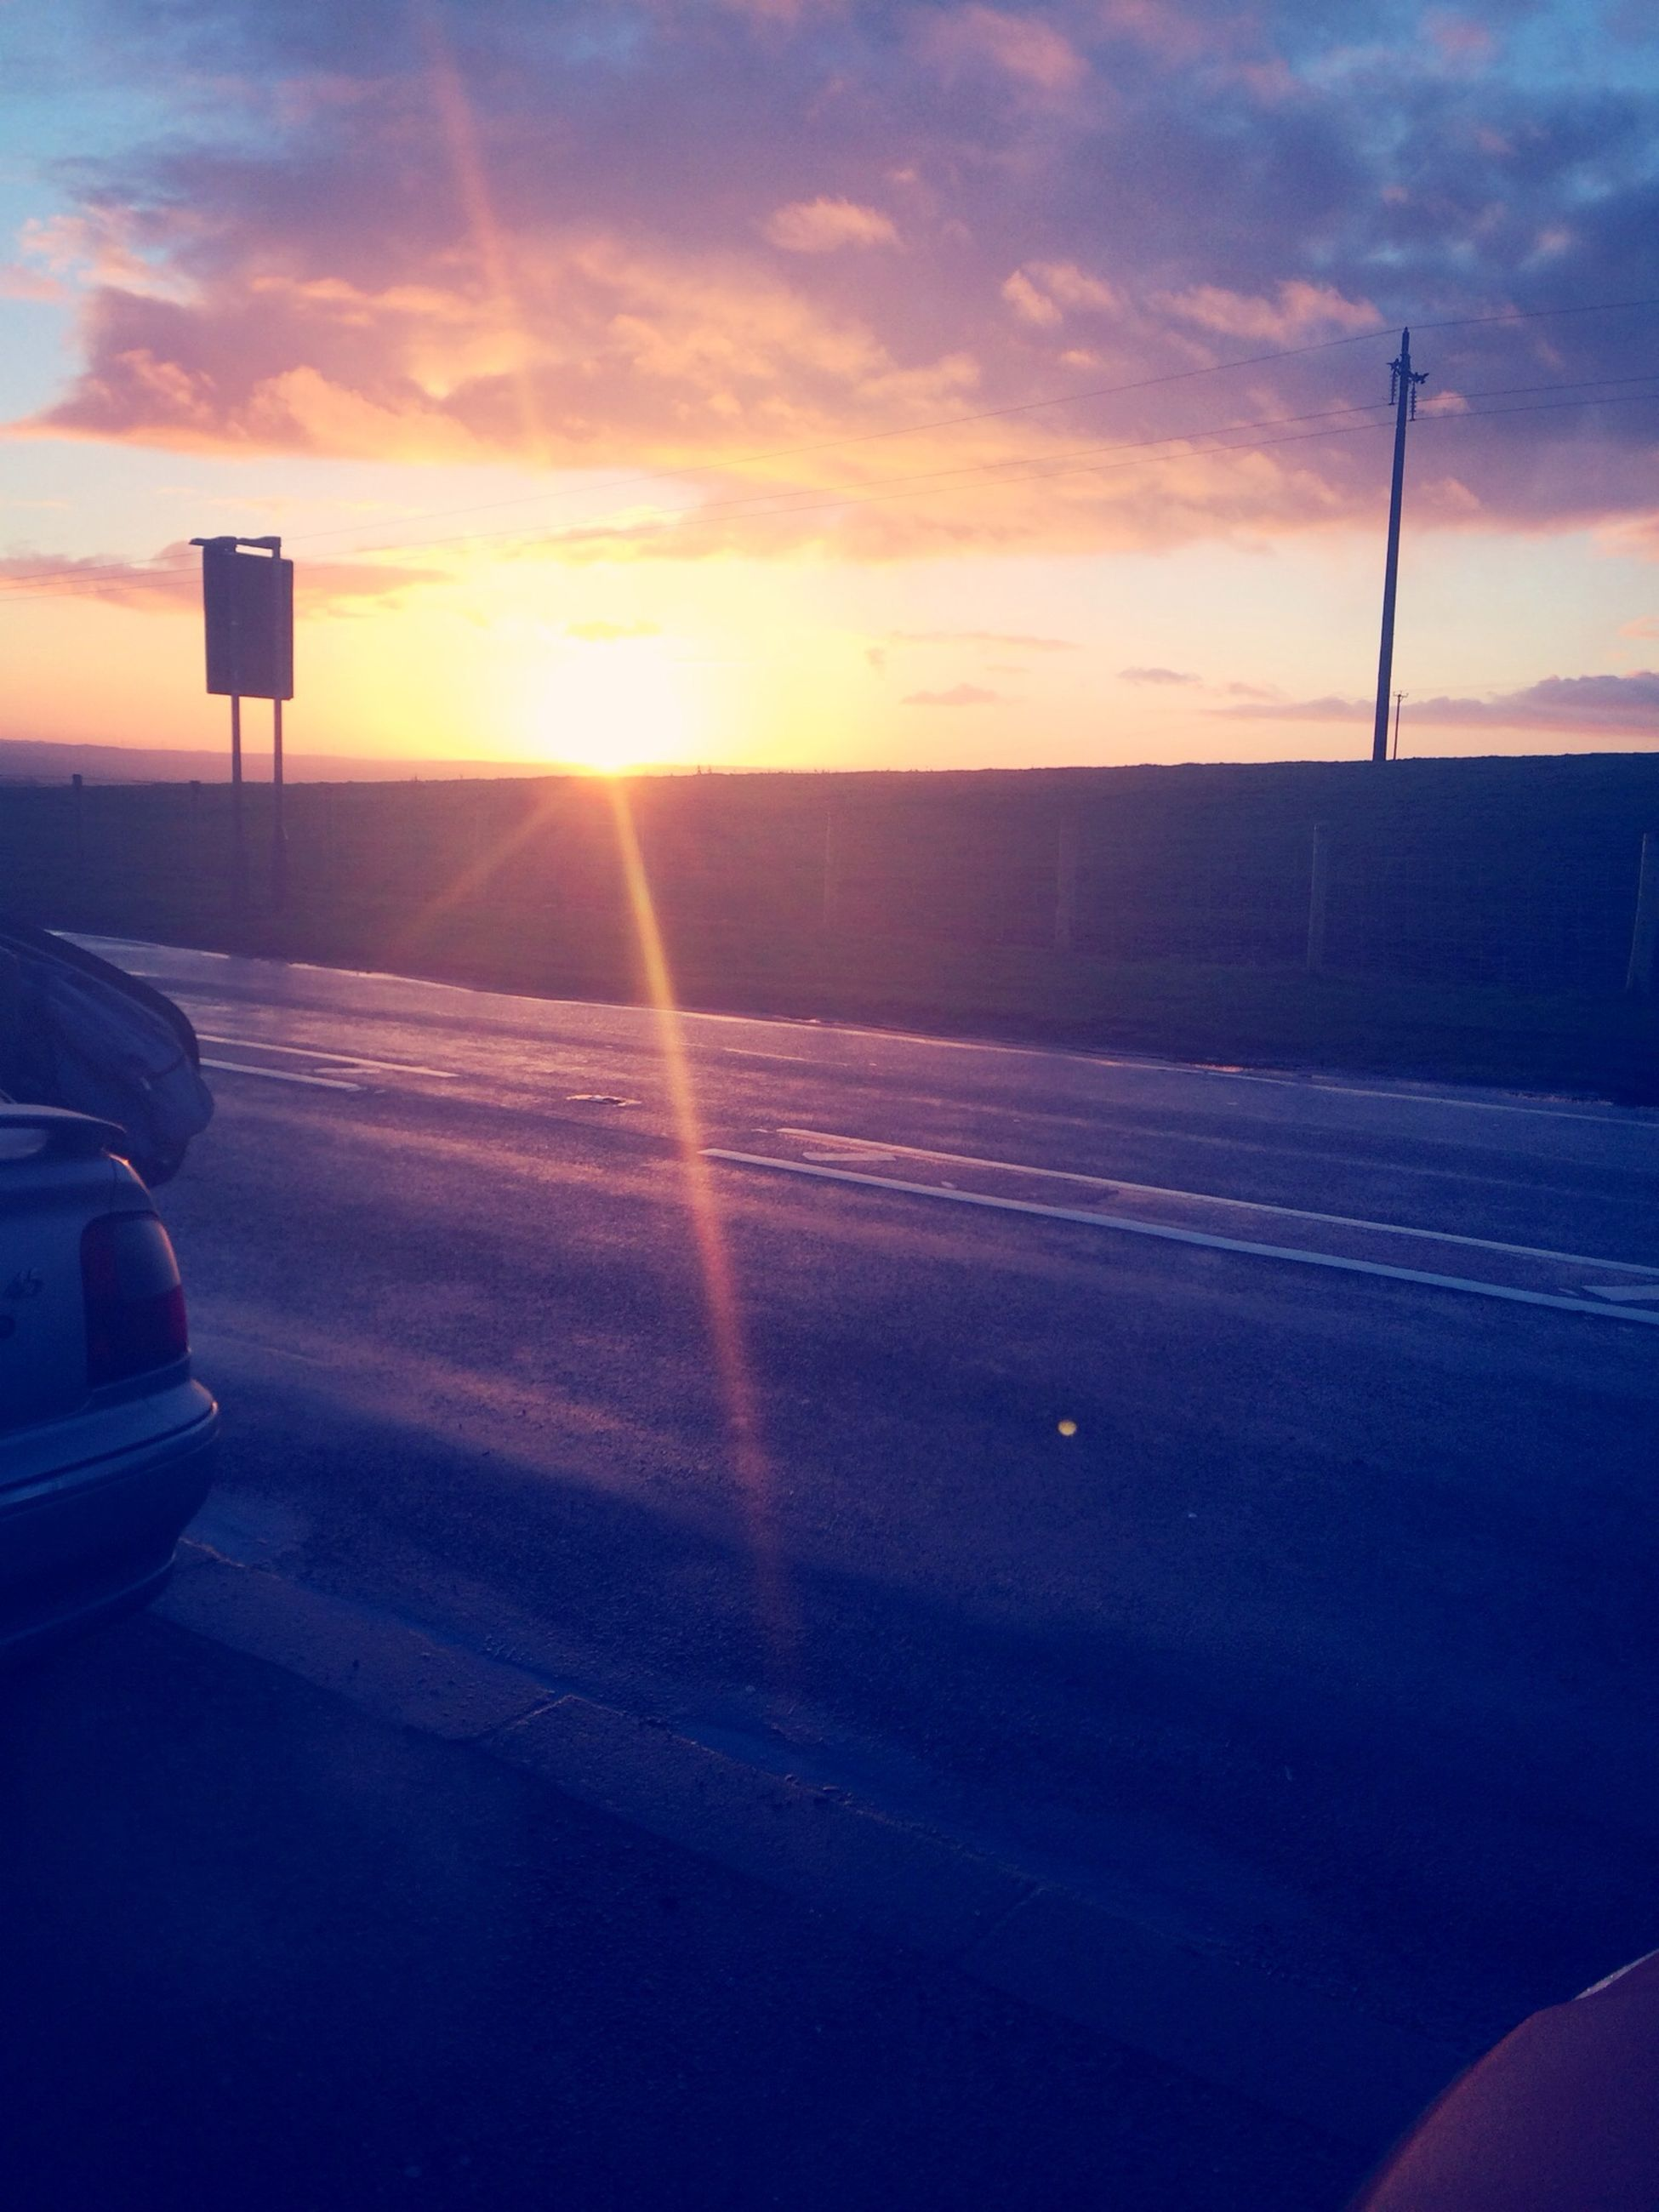 sunset, transportation, sky, sun, car, land vehicle, mode of transport, road, cloud - sky, orange color, scenics, sunlight, beauty in nature, street, nature, cloud, lens flare, tranquility, sunbeam, tranquil scene